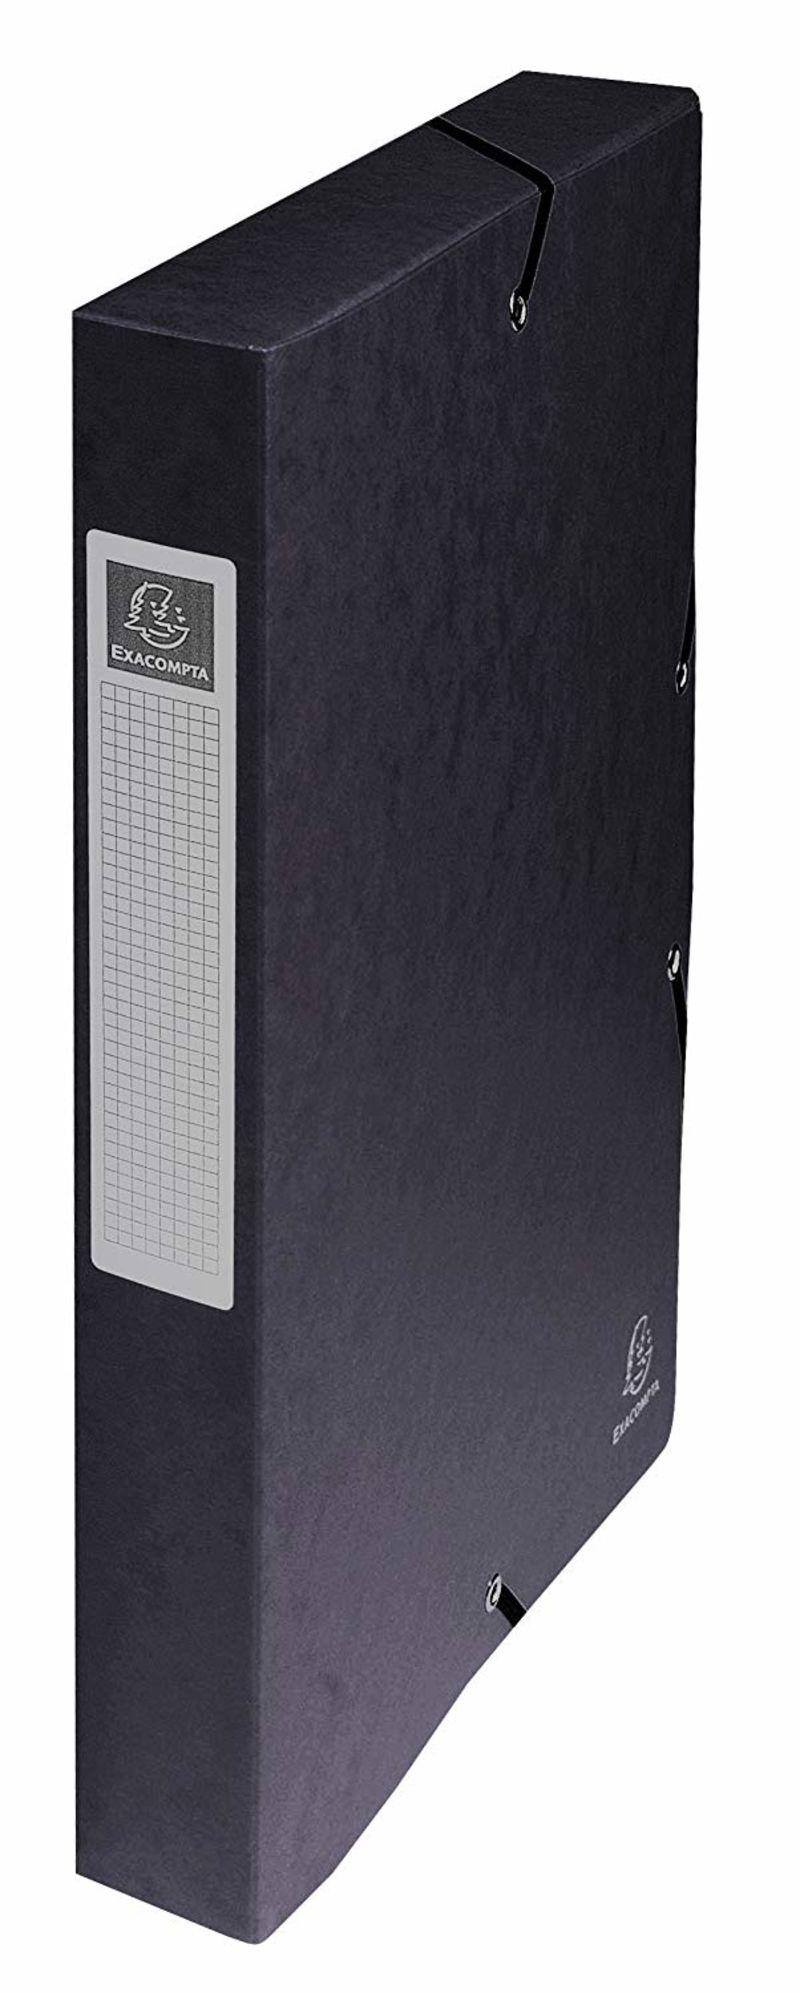 Carpeta Proyectos A4 Negra 40mm Cartulina Lustrada R: 50401e -